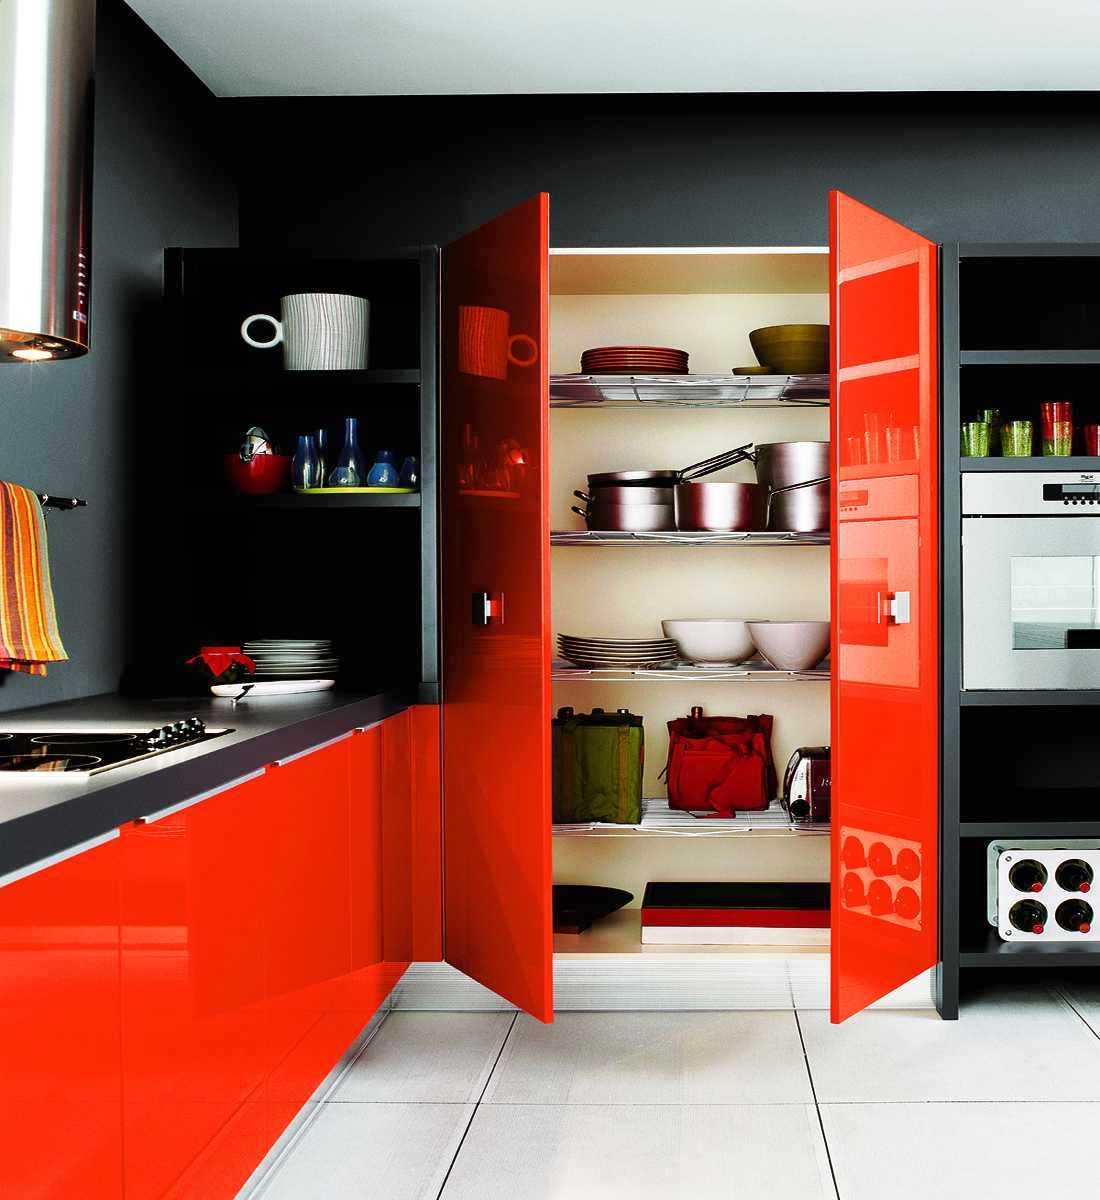 kitchen color schemes modern kitchen designs Poppy orange and ebony